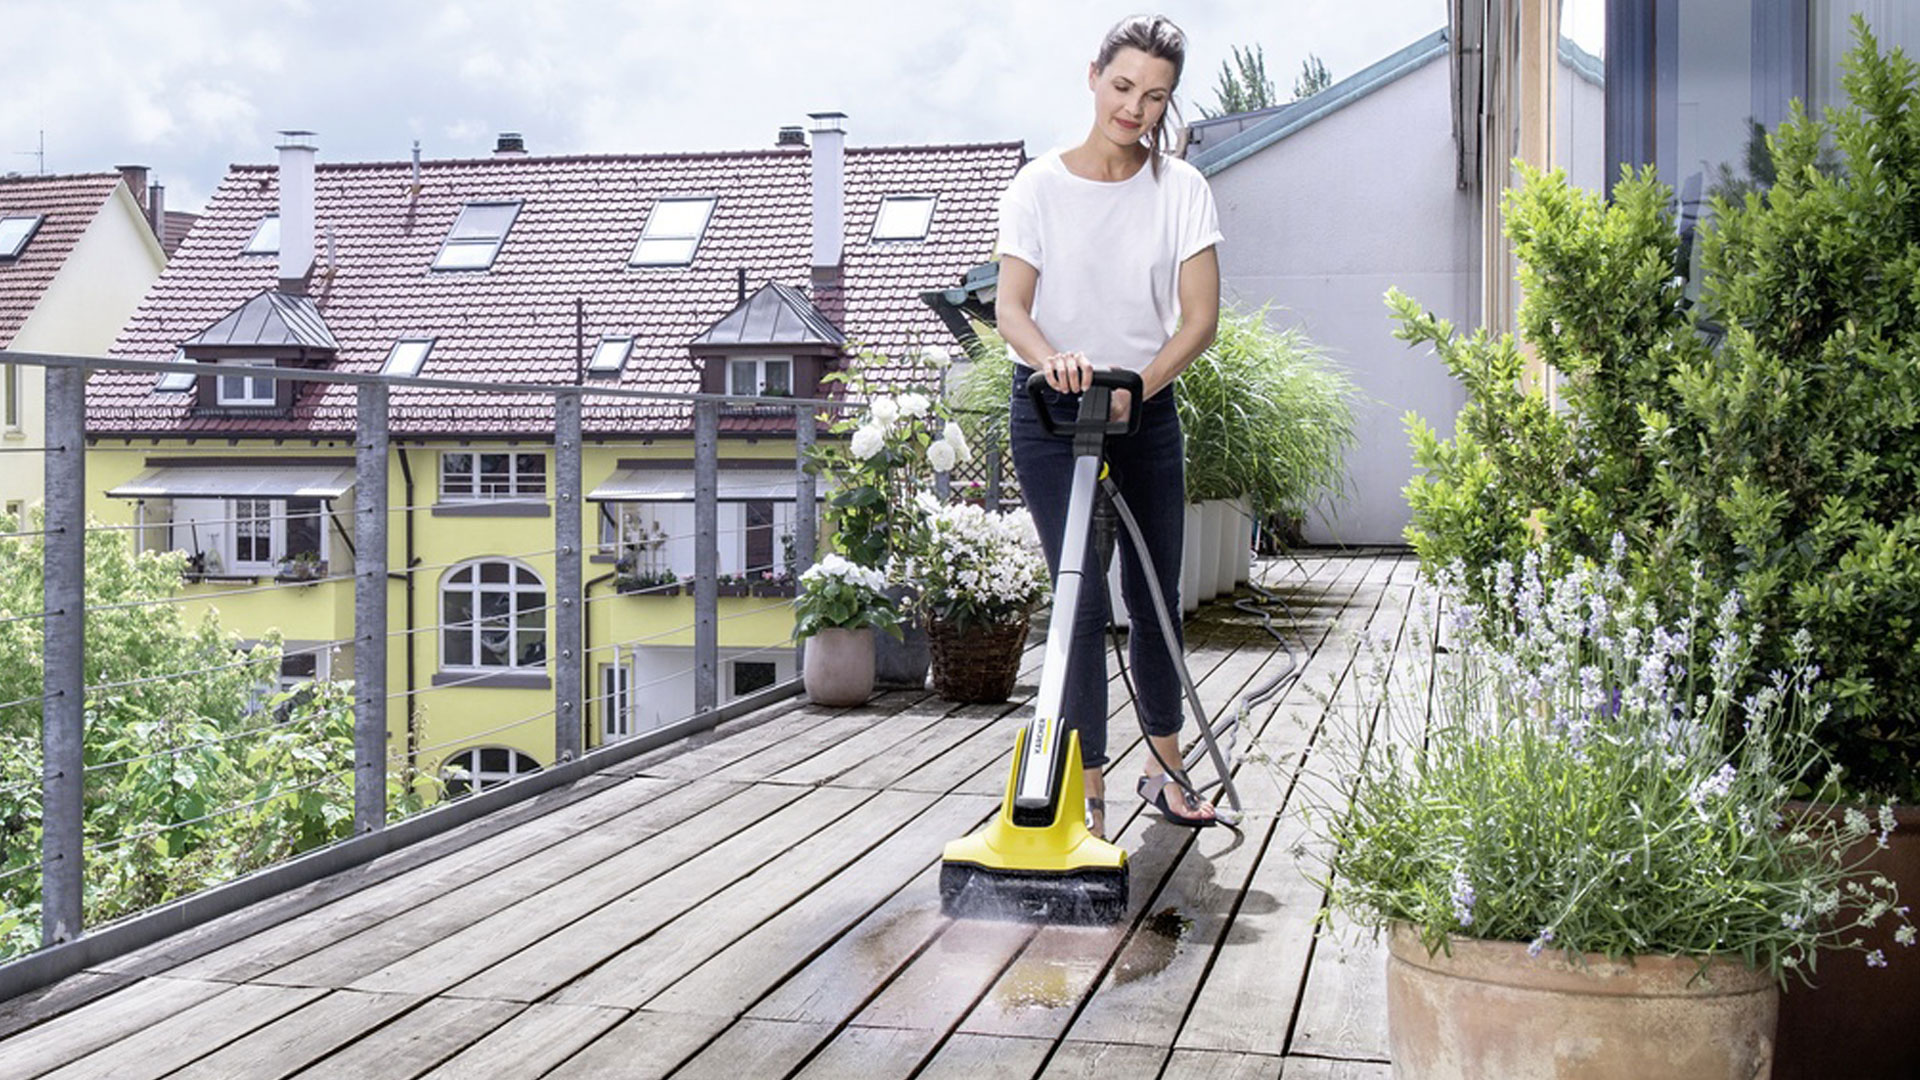 Comment Nettoyer Terrasse Pierre Naturelle nettoyage de terrasse | kärcher